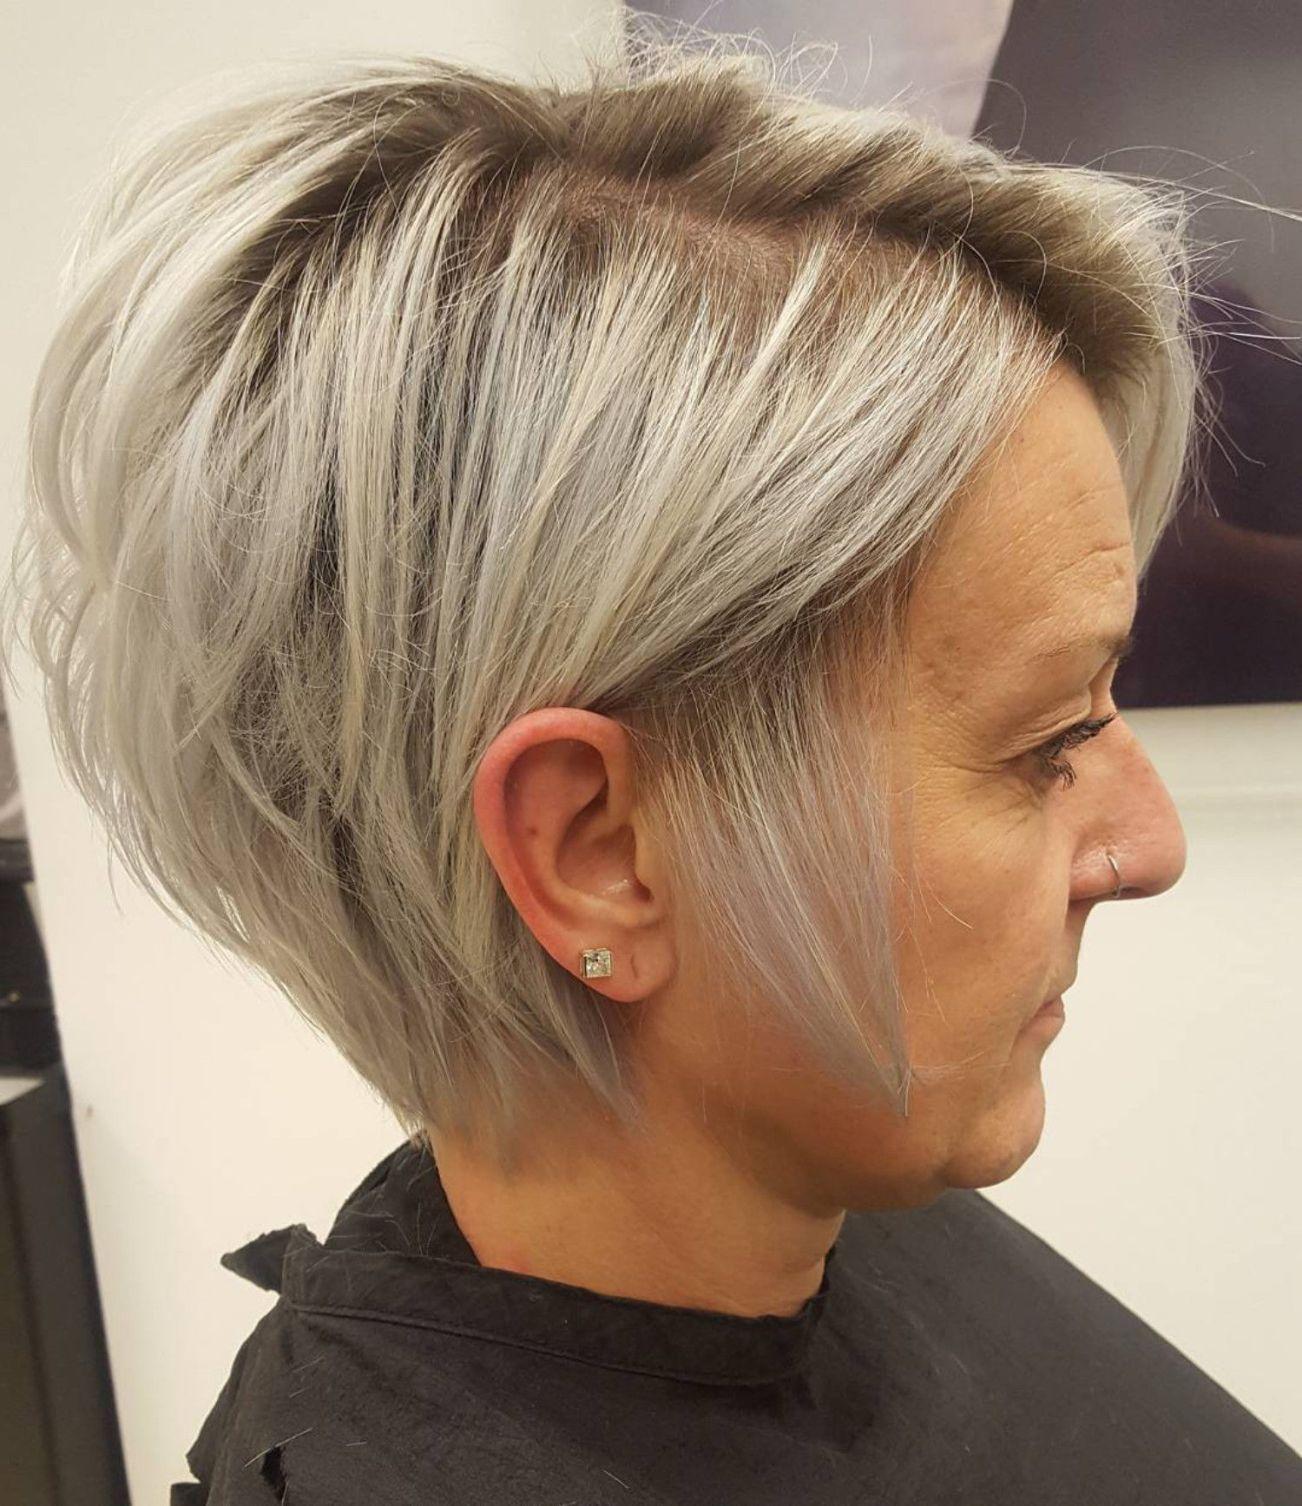 50 Blonde Tousled Pixie Bob Kapsels Kapsels Voor Kort Haar Haarstijlen